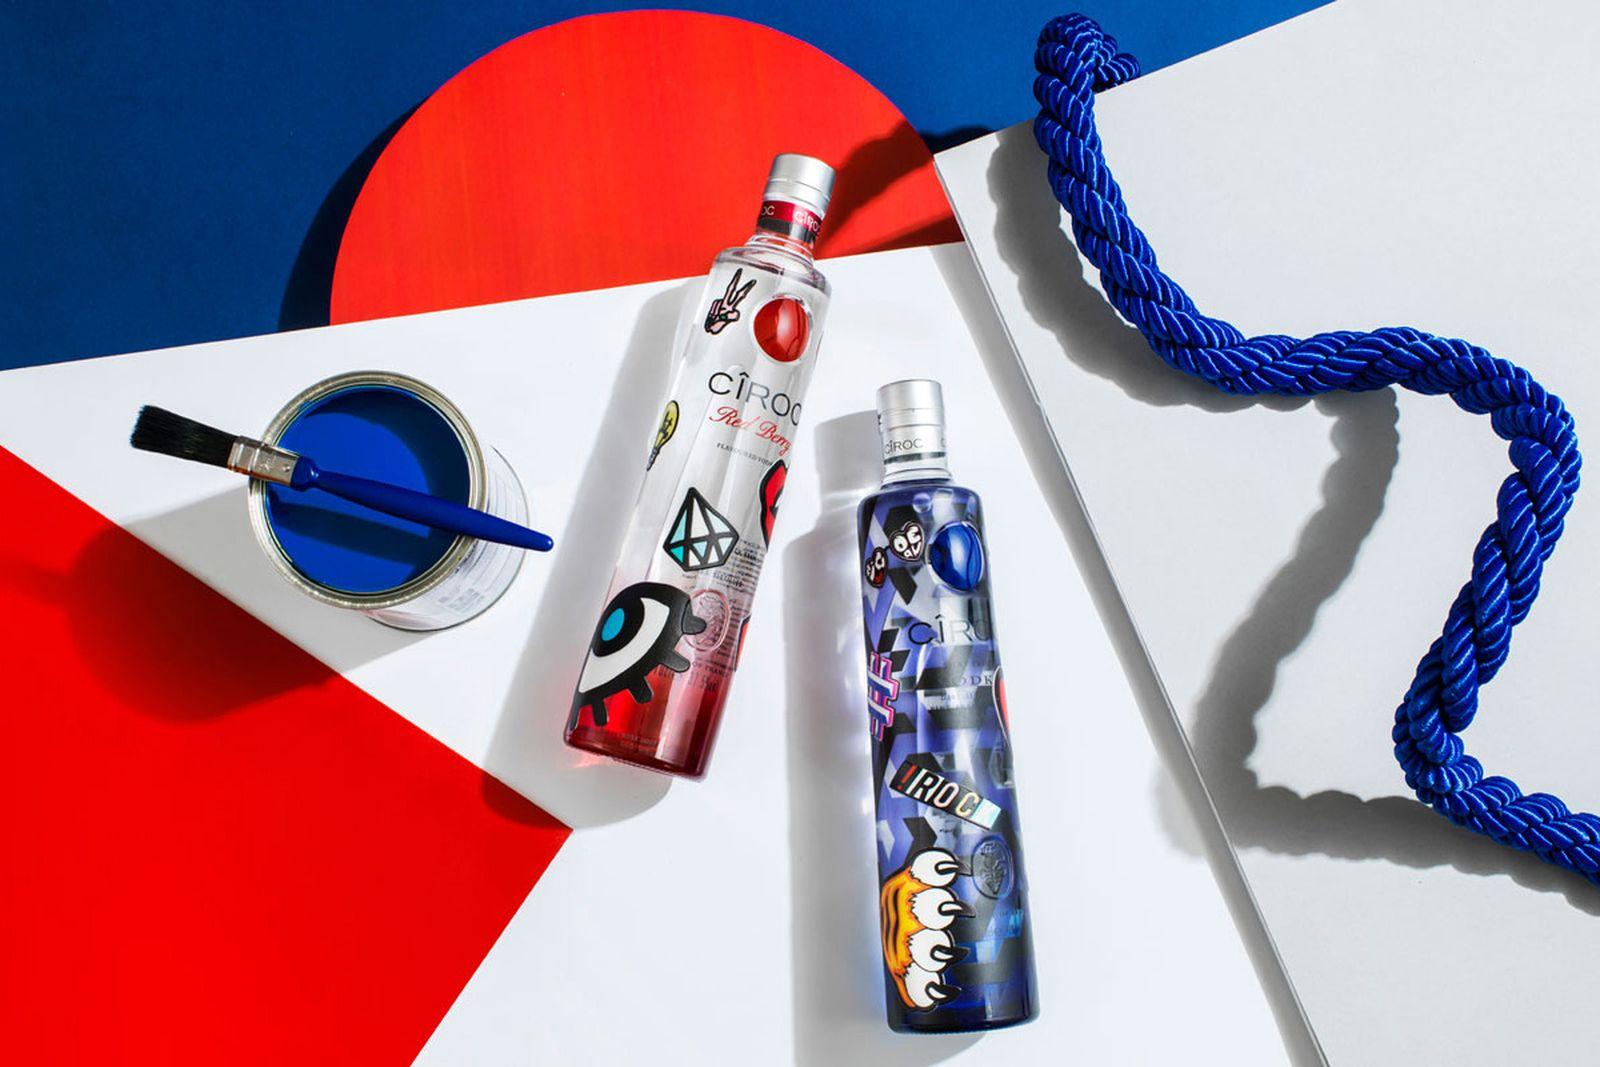 INKD Ciroc spirits bottle design CÎROC